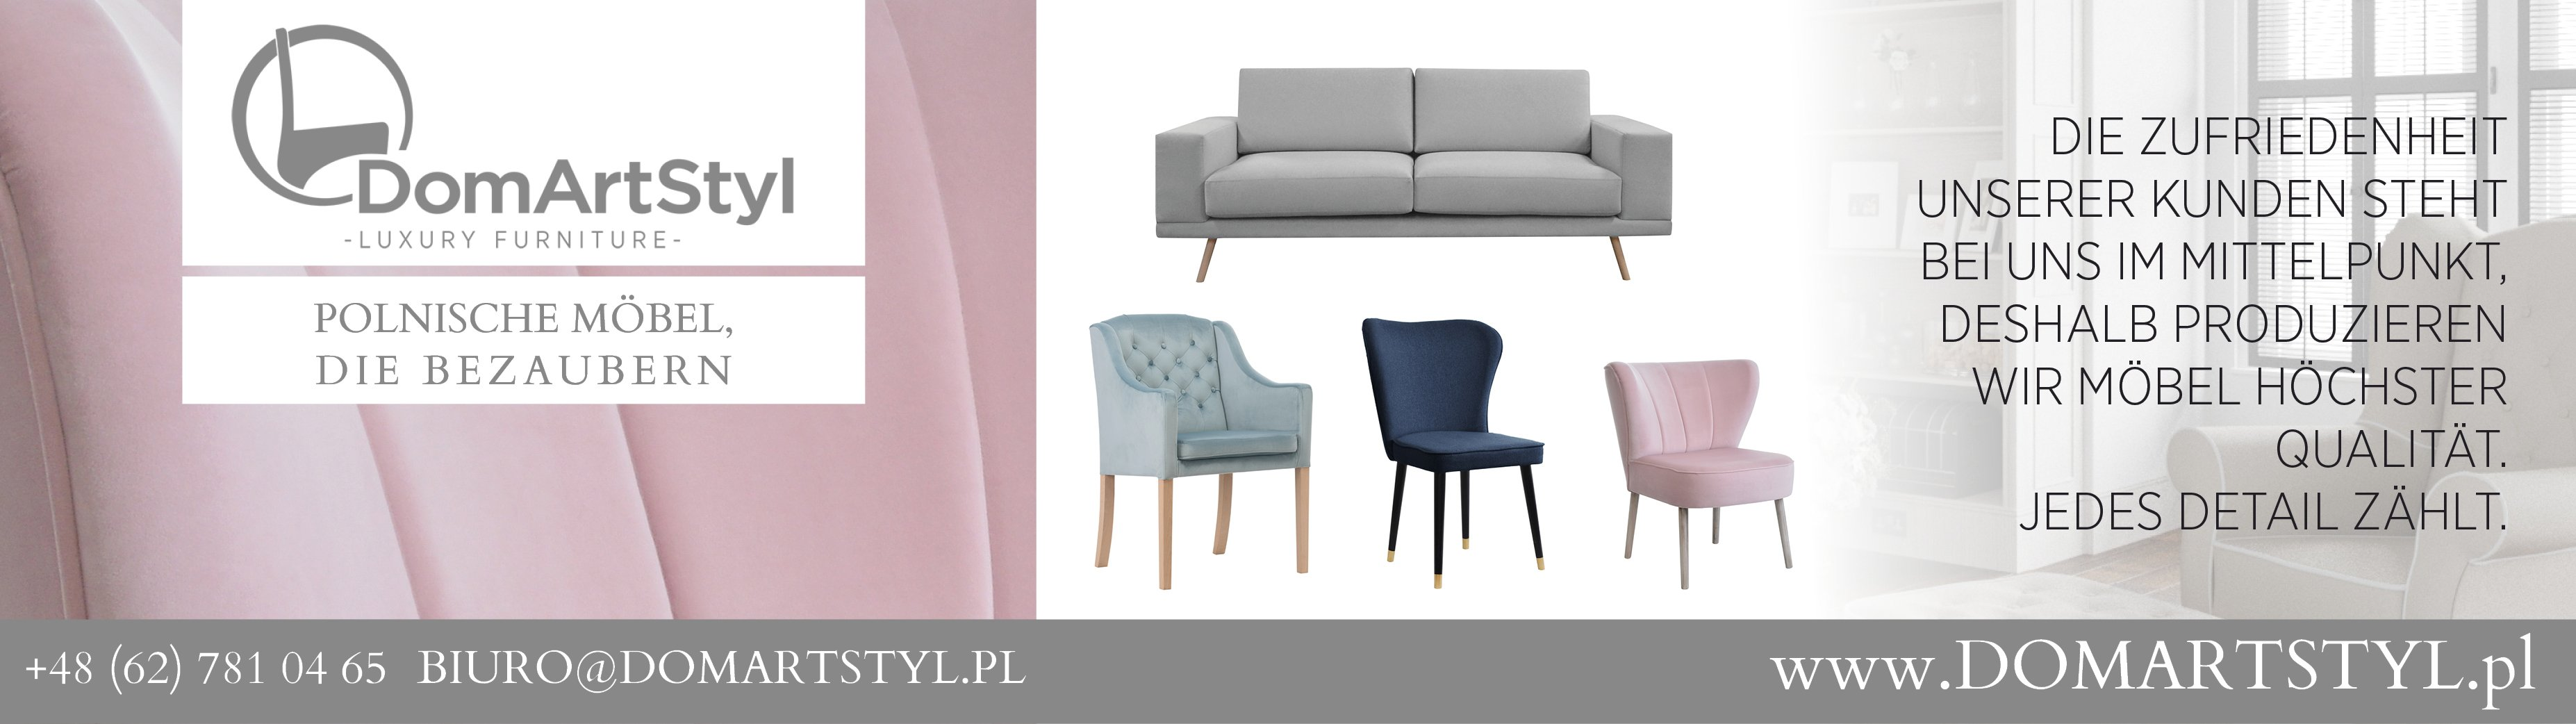 DomArtStyl - Möbel die verzaubern